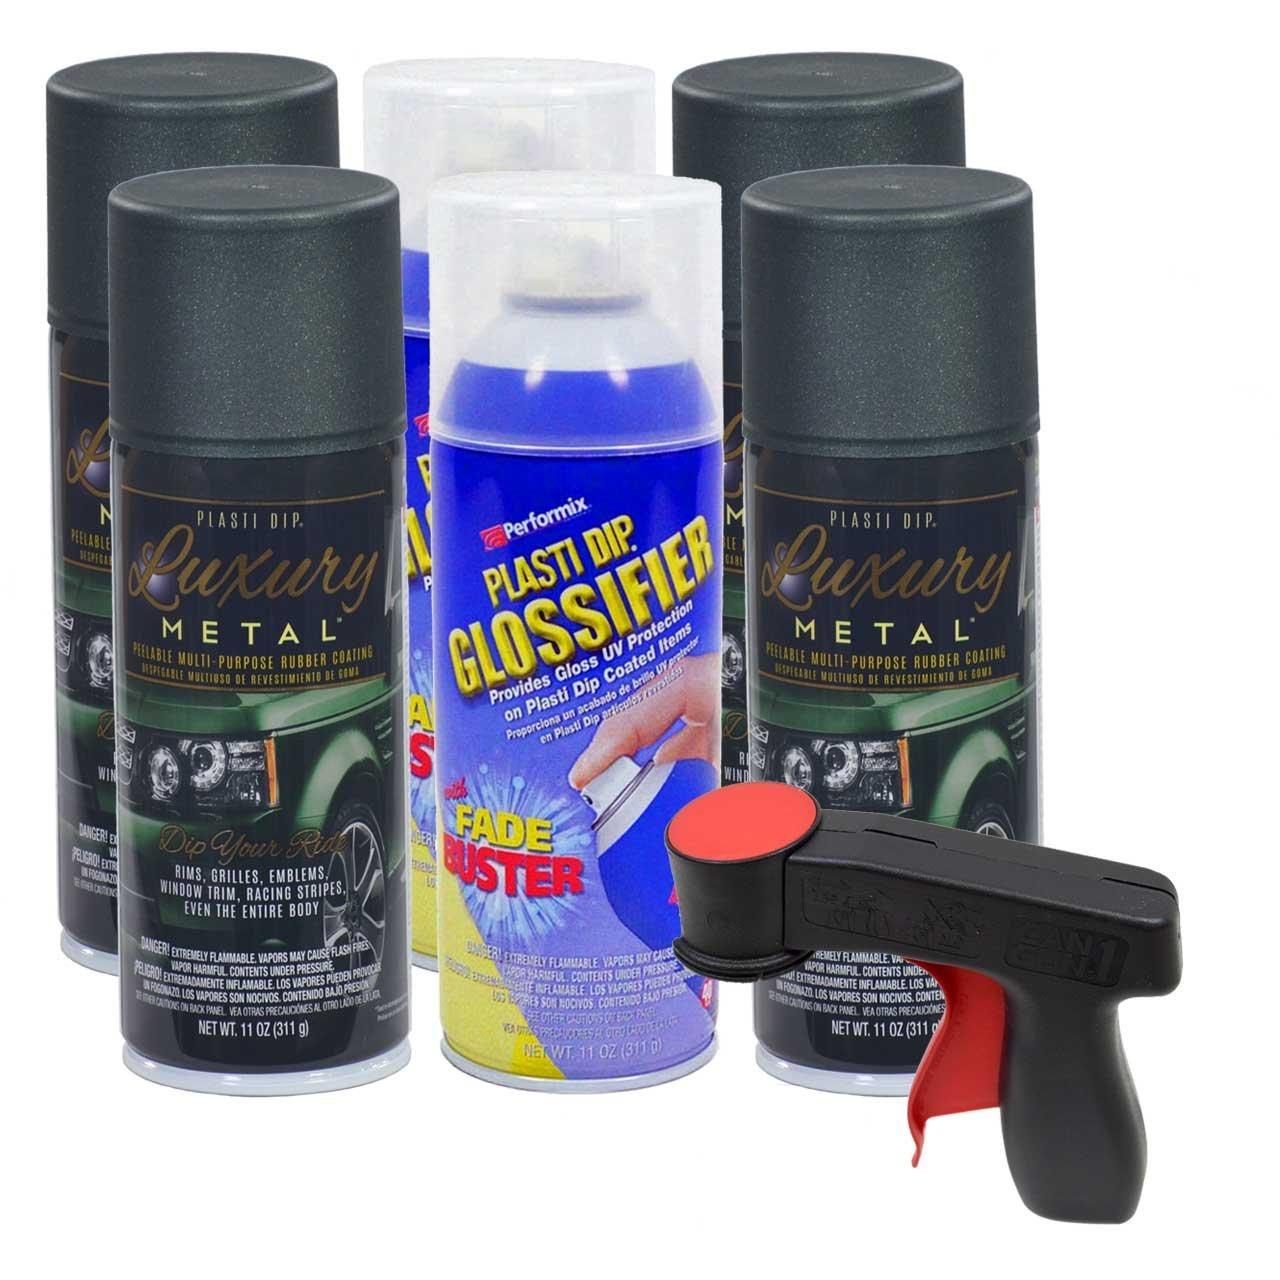 Plasti Dip Rim Kit: 4 Aerosol Cans Luxury Aintree Green Metallic, 2 Aerosol Cans Glossifier, 1 Cangun